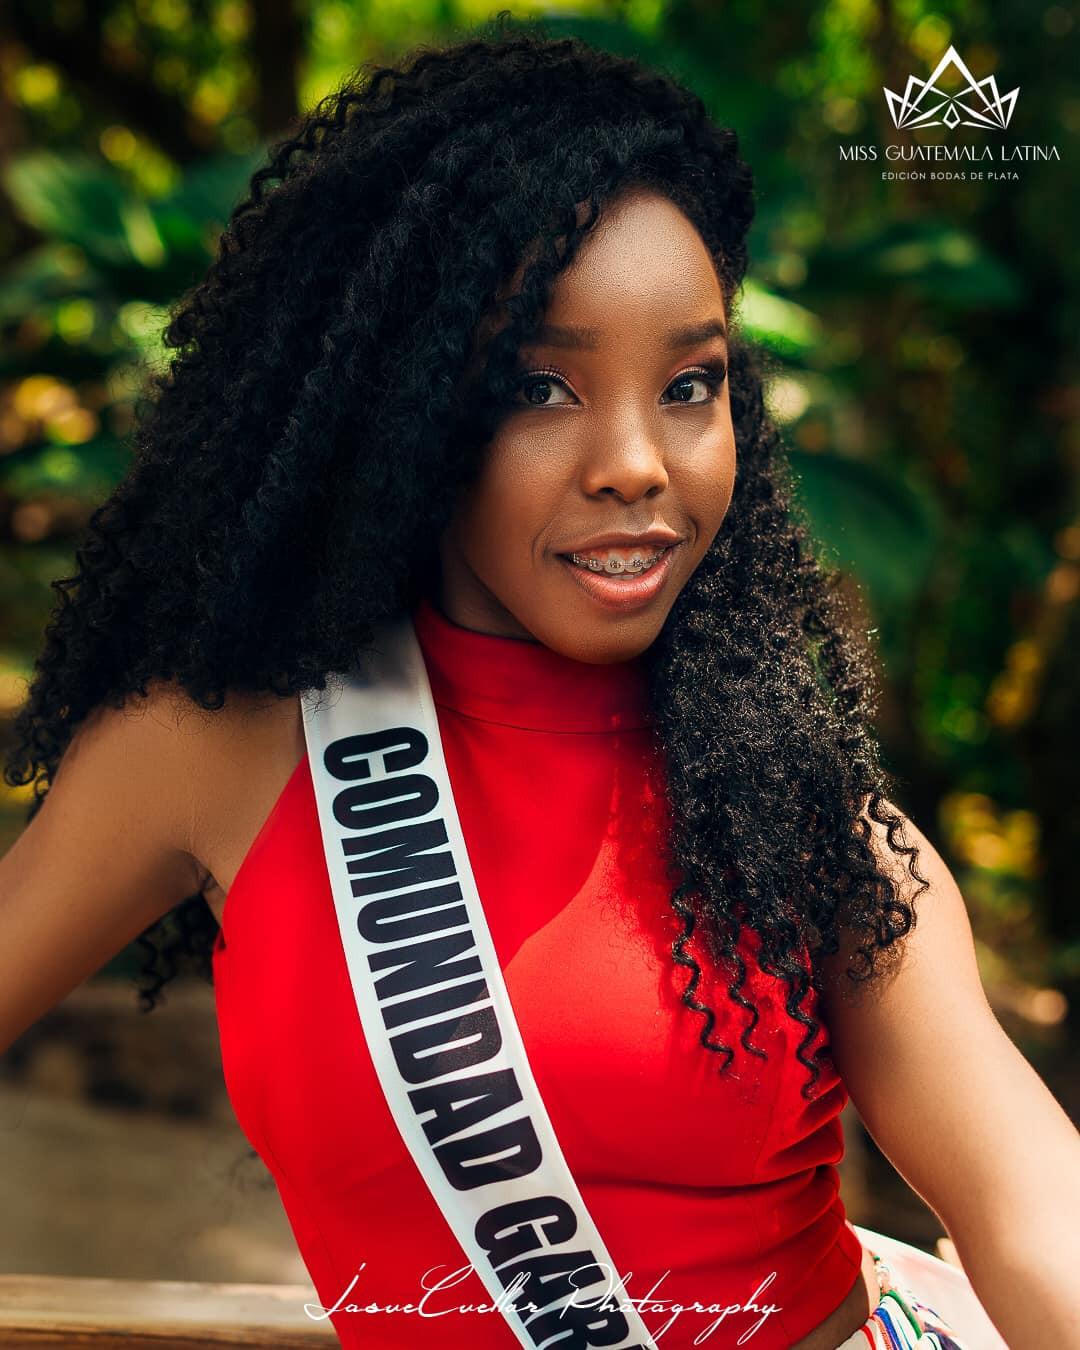 candidatas a miss guatemala latina 2021. final: 30 de abril. - Página 7 BFjril